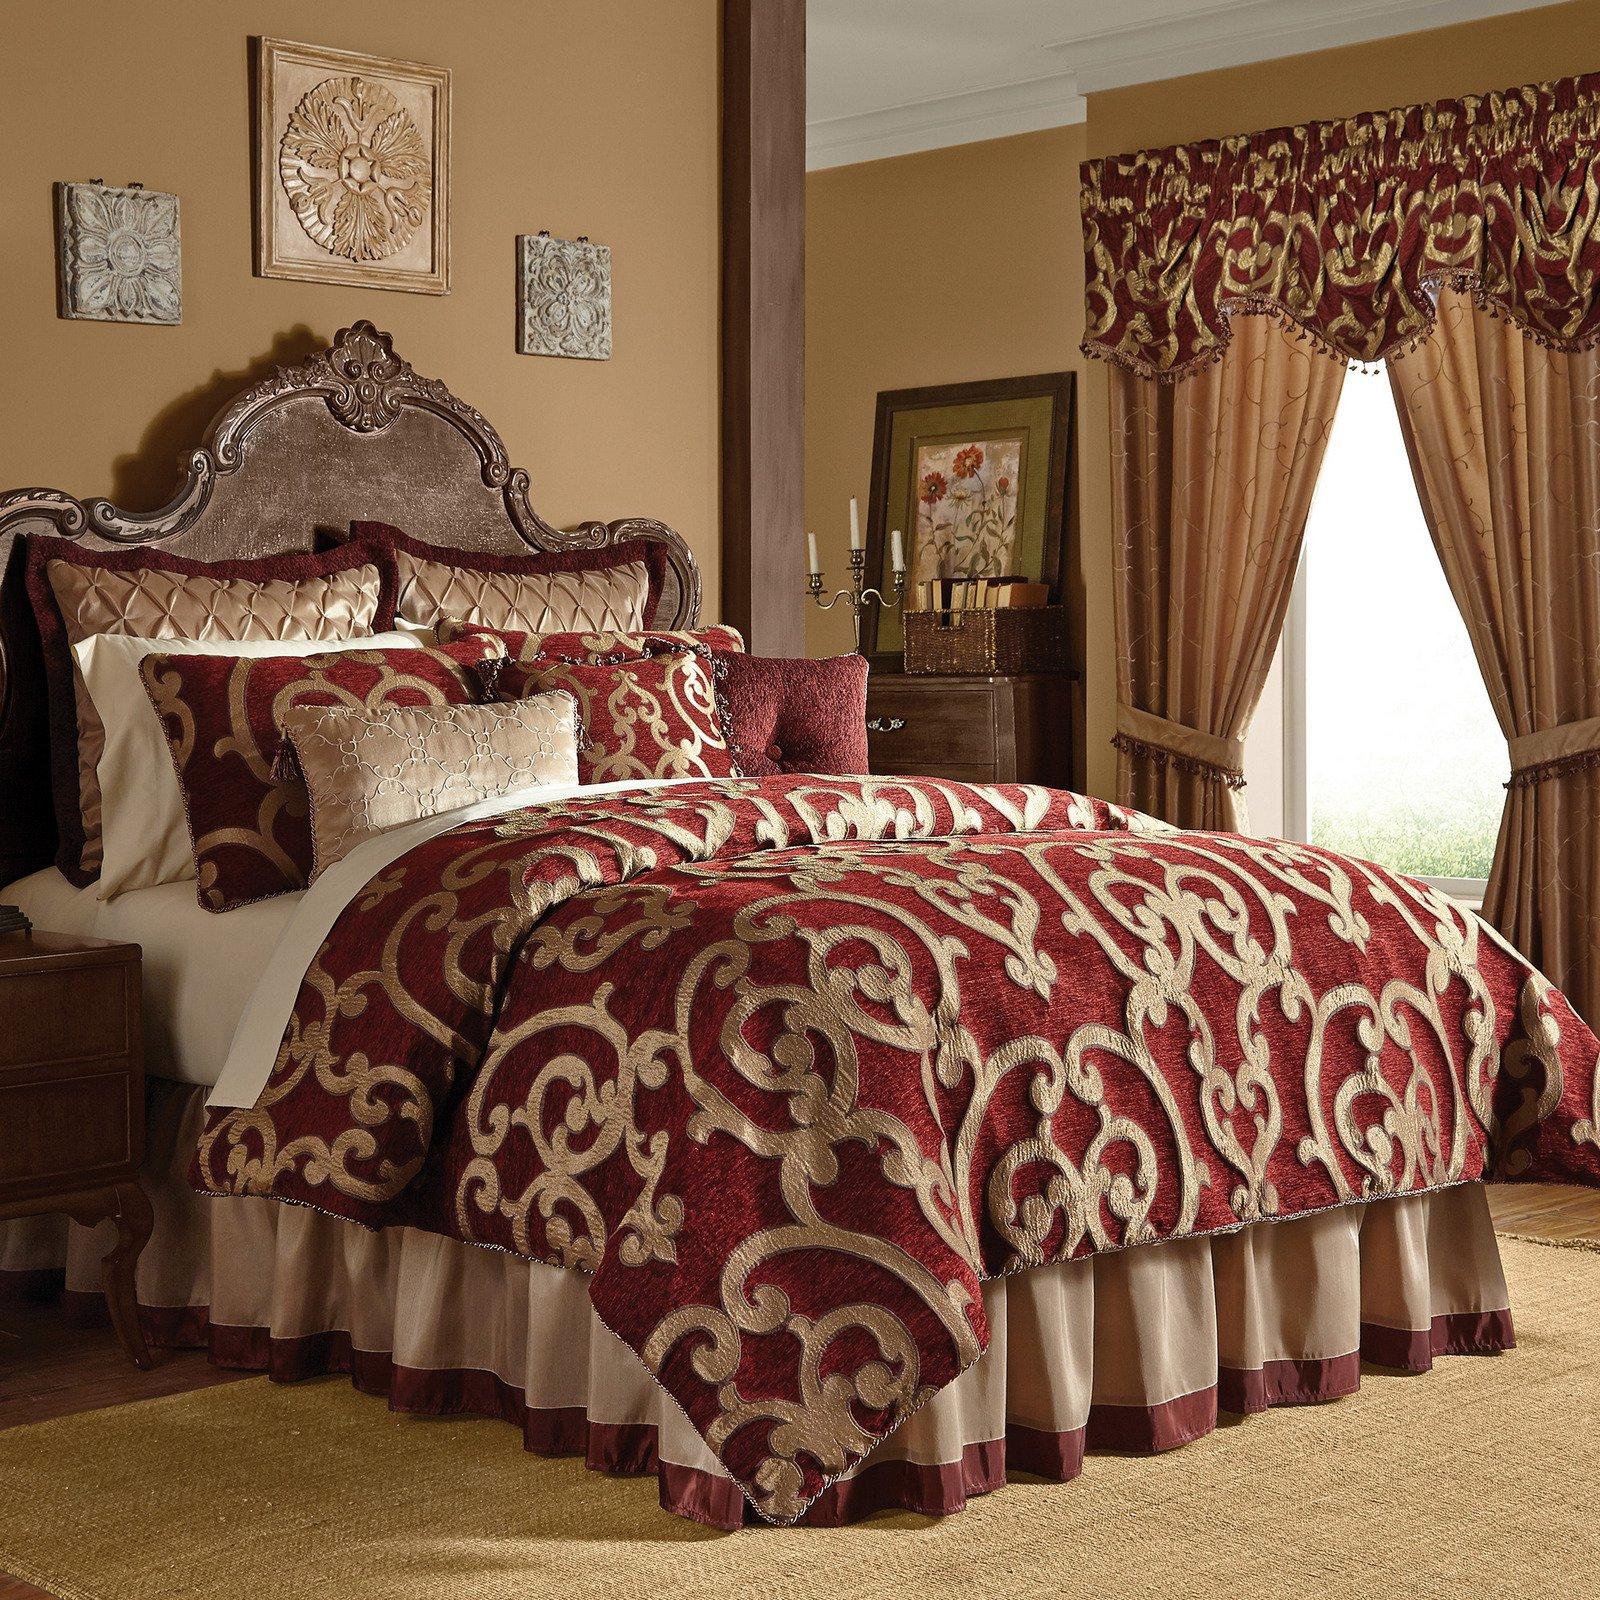 Red Comforter Set In King Or Queen